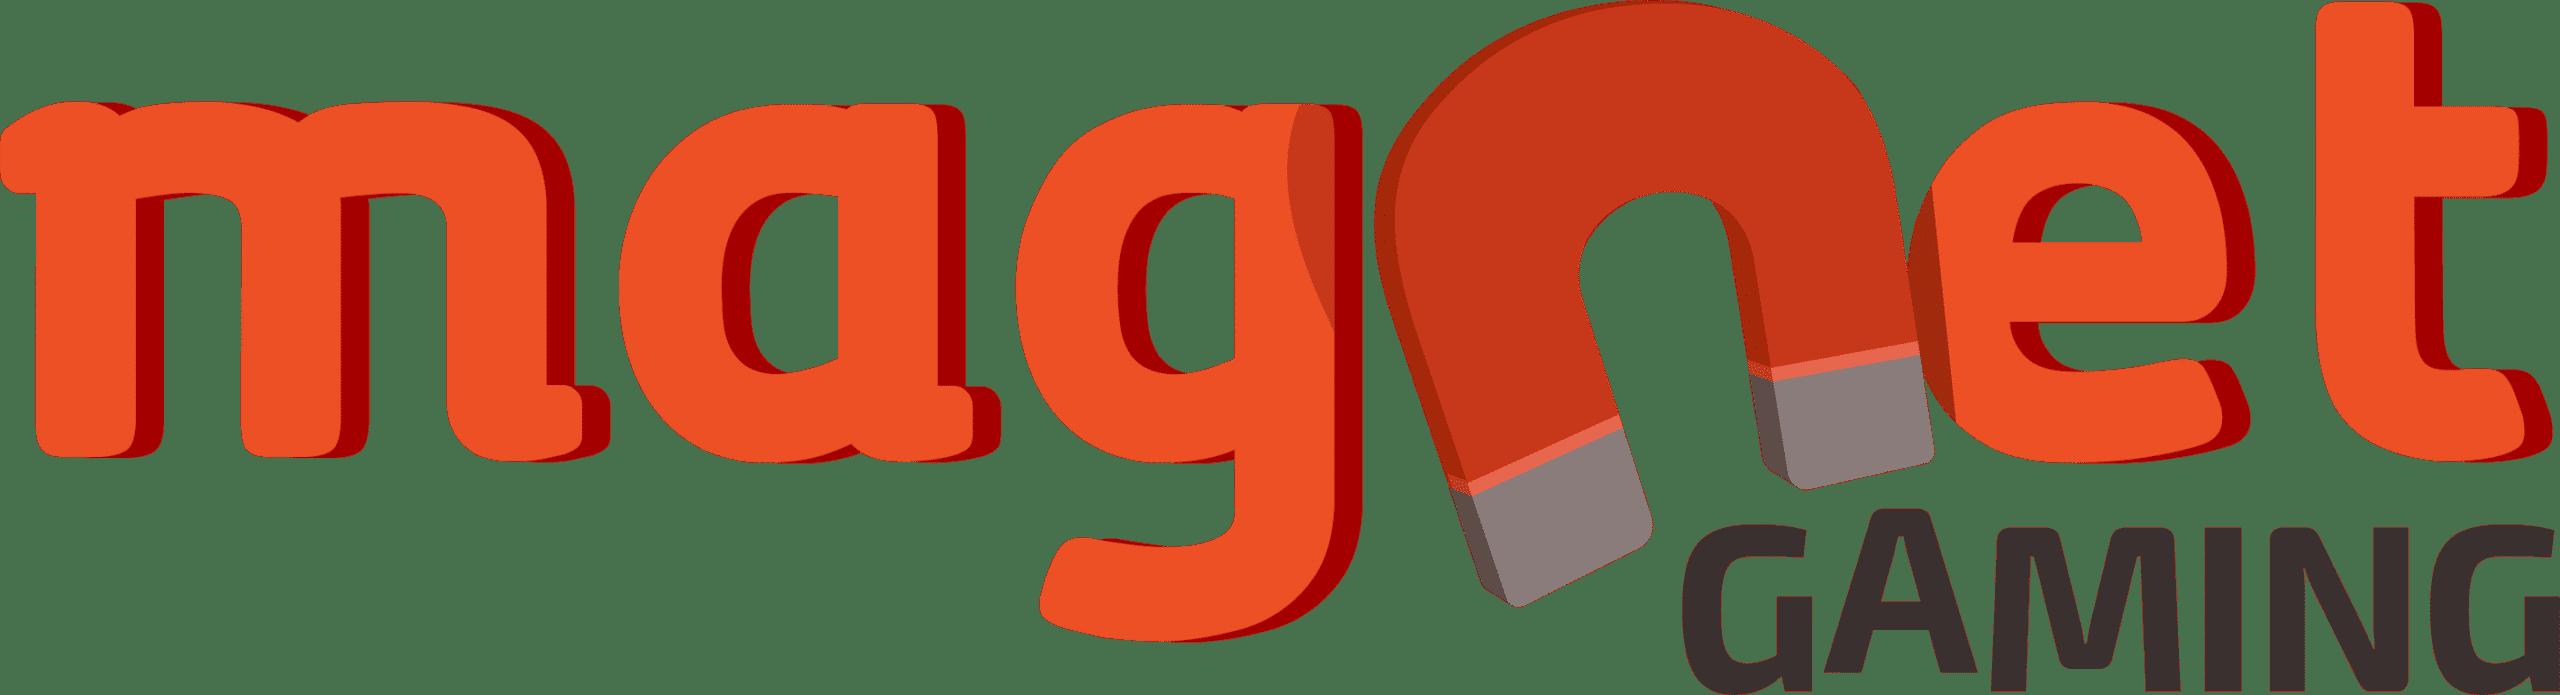 Magnet Gaming best online casino software provider for Australians